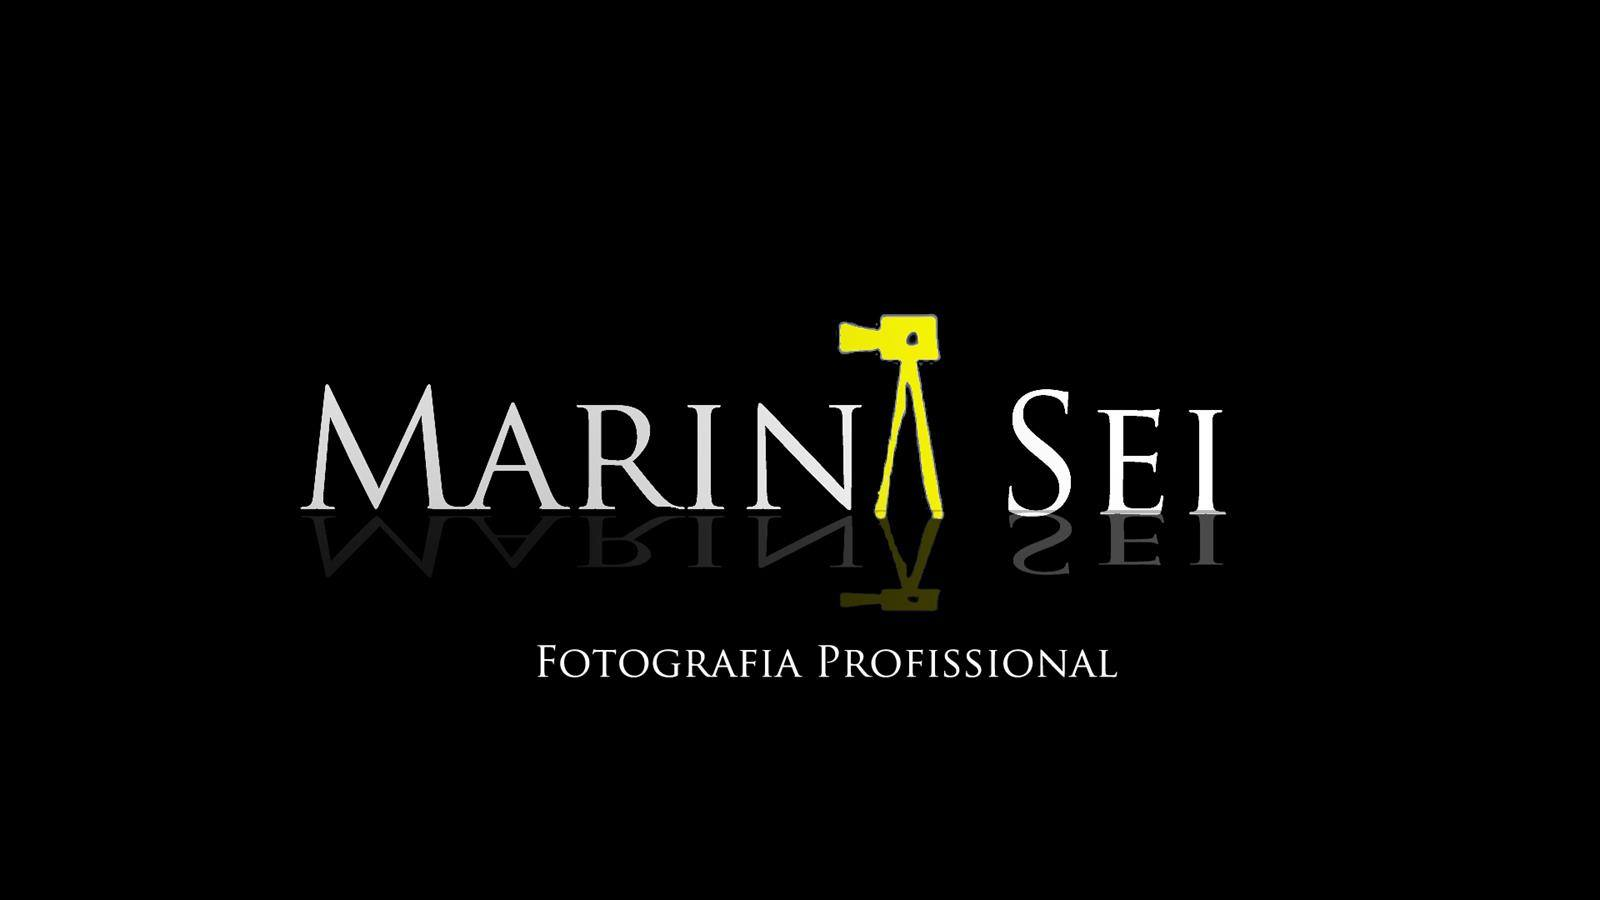 Marina Sei Fotografia